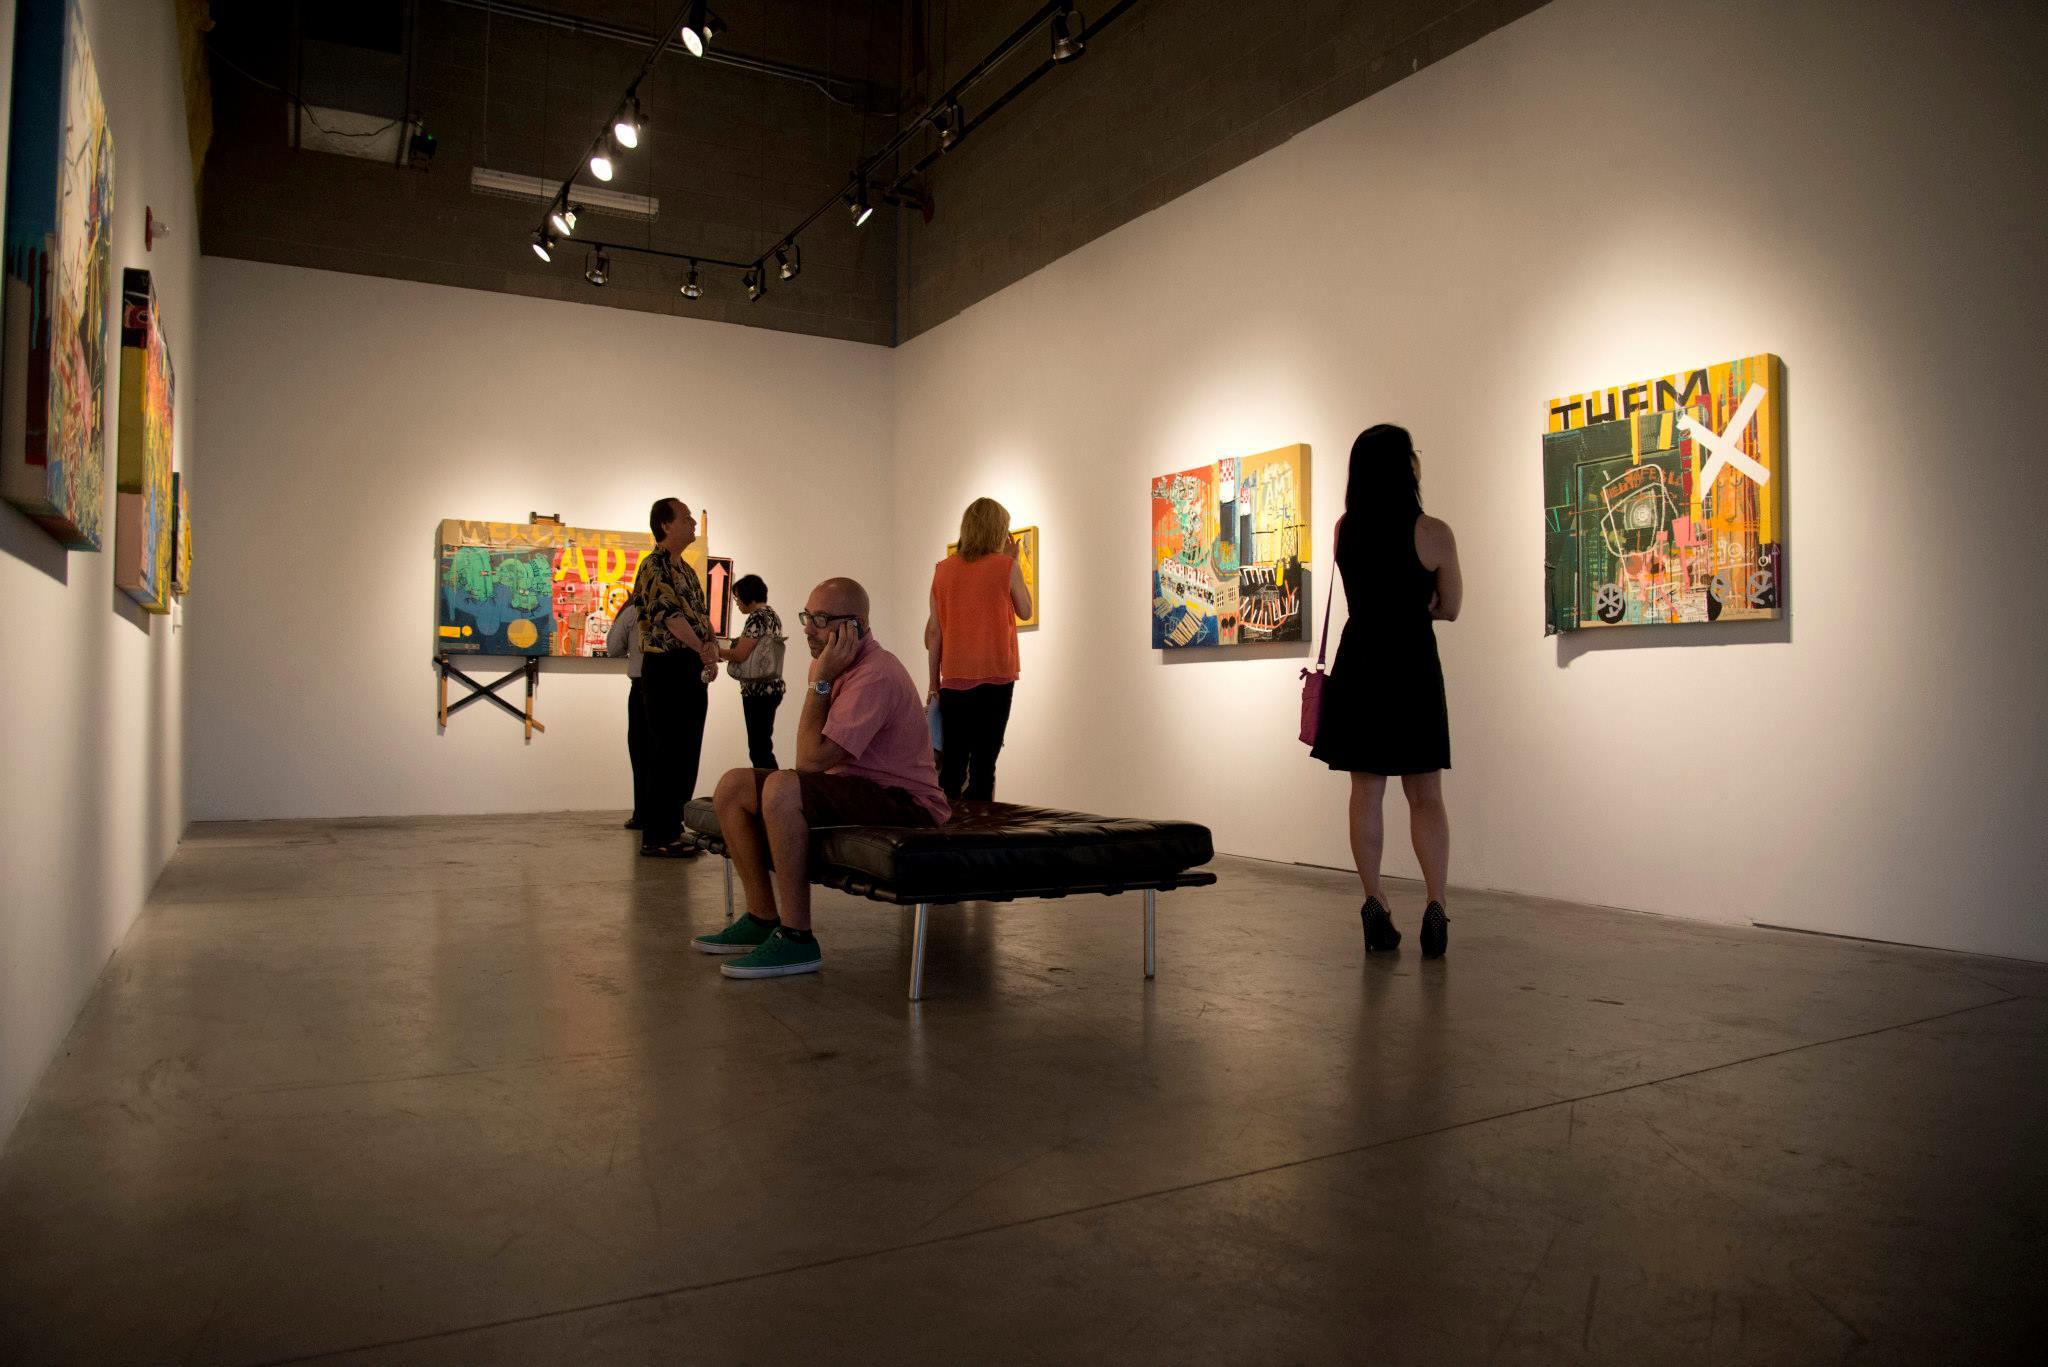 The art galleries